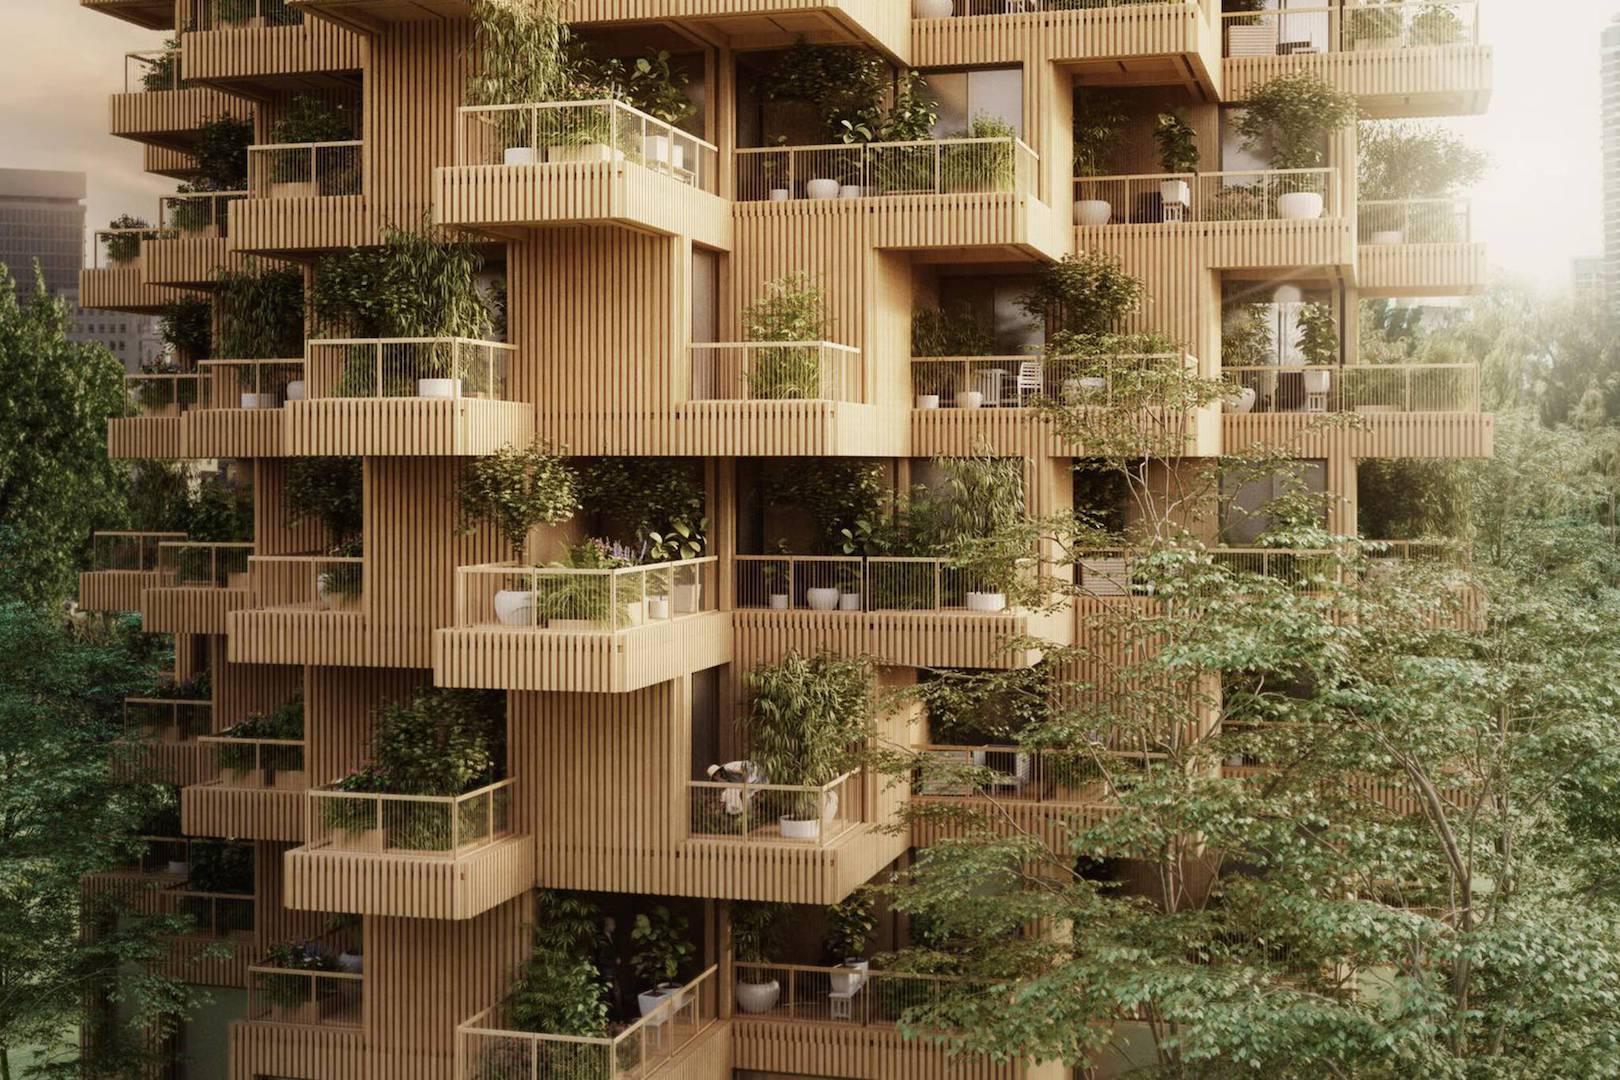 FRAMEWORK BUILDING (Portland, USA, 2018) Lever Architecture